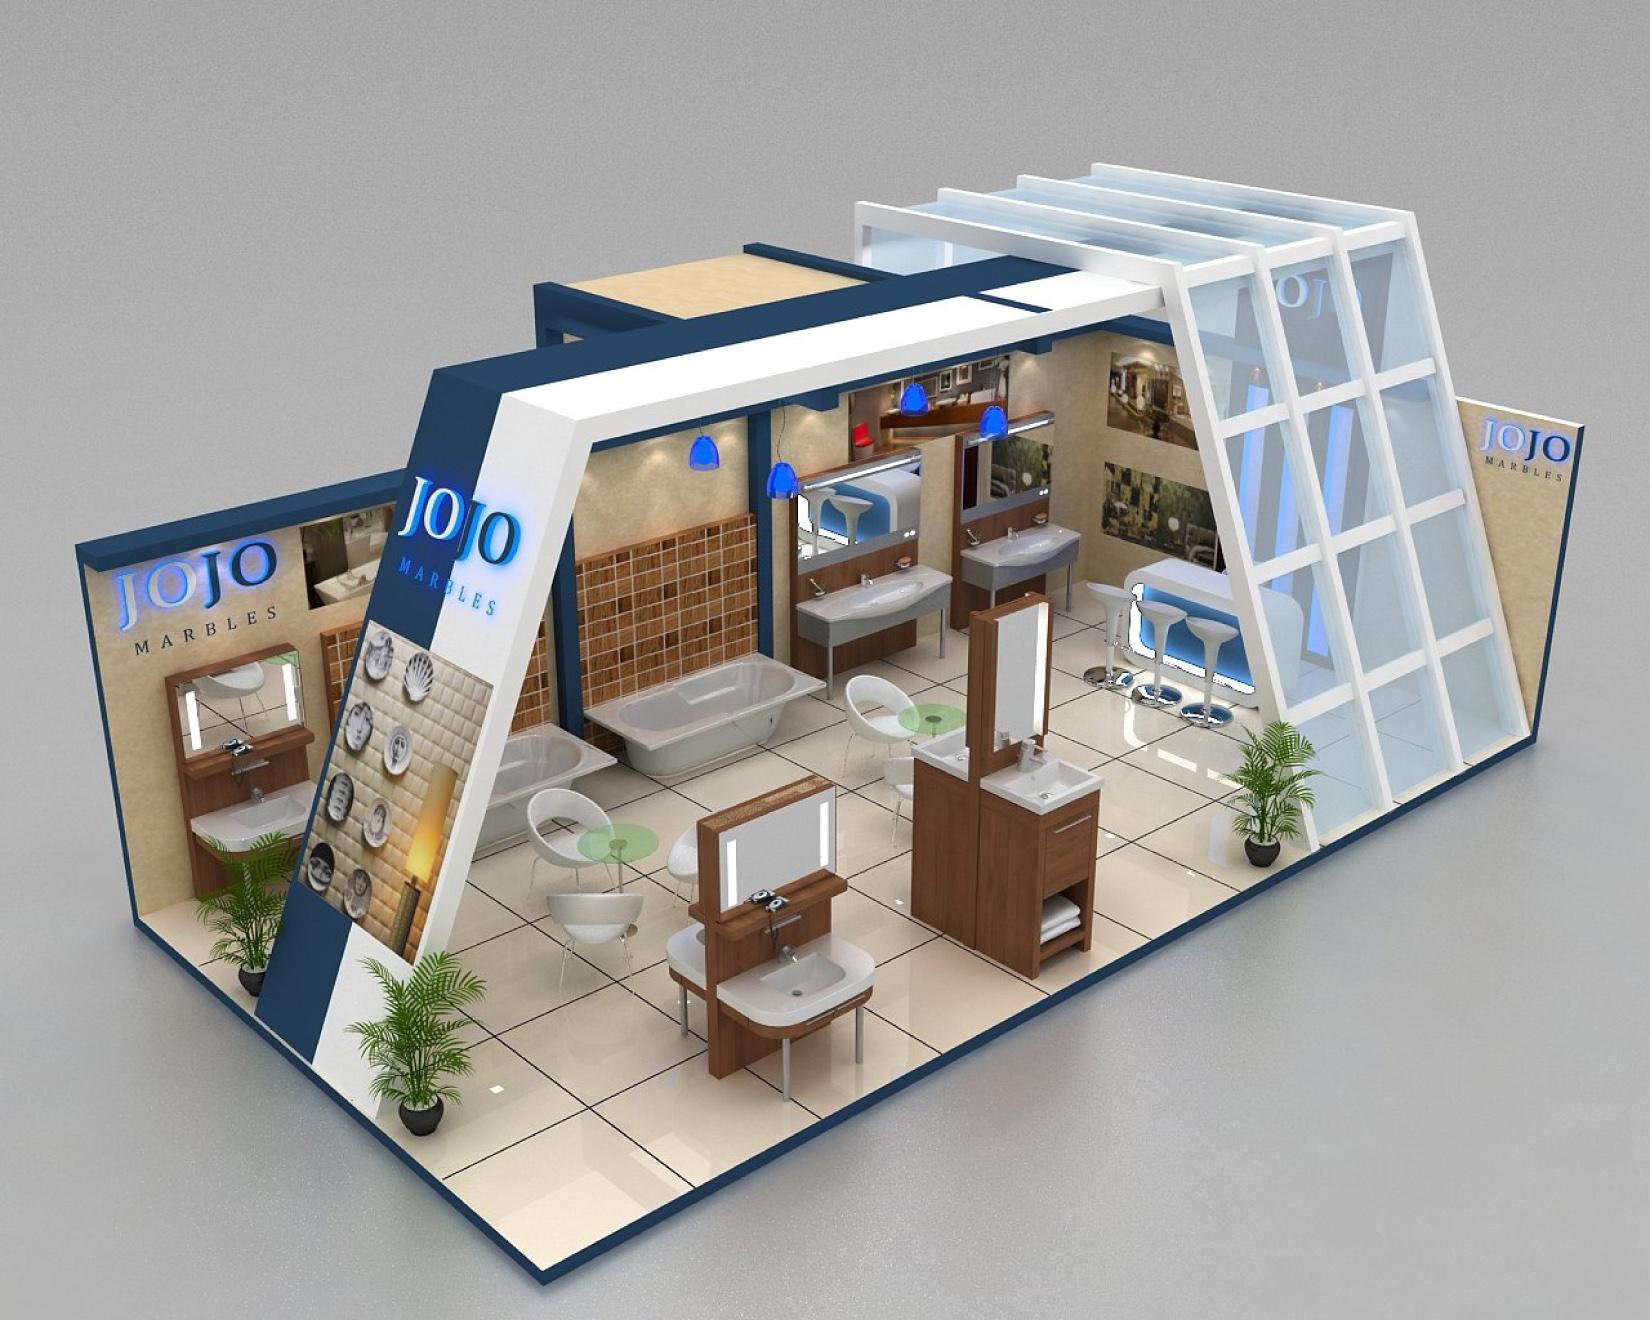 Exhibition Stand Floor Plans : Exhibition design by akshay jain at coroflot